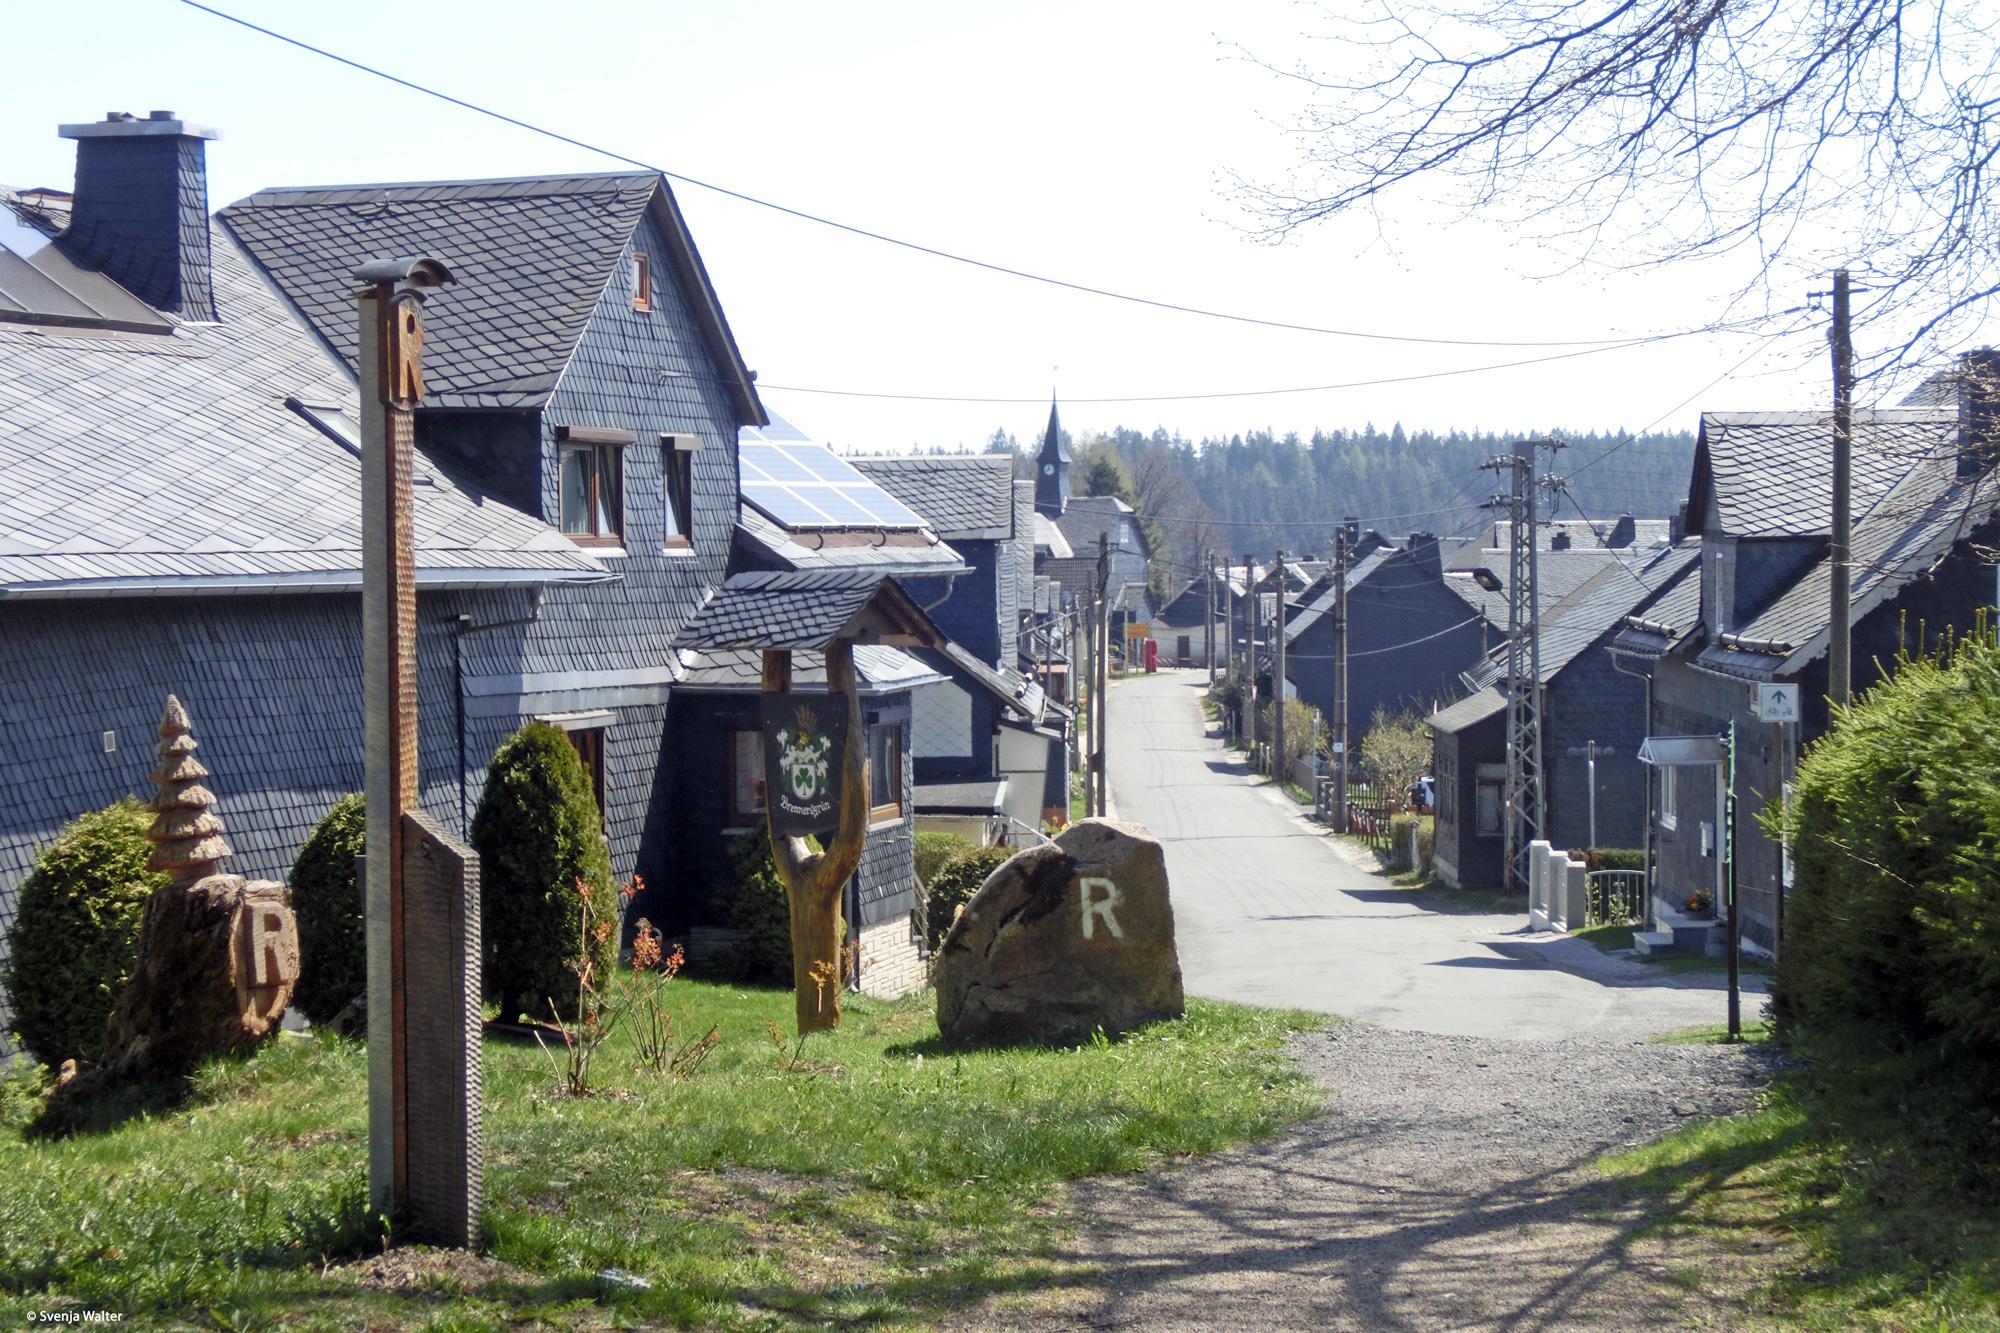 Der hübsche Ort Brennersgrün © Svenja Walter